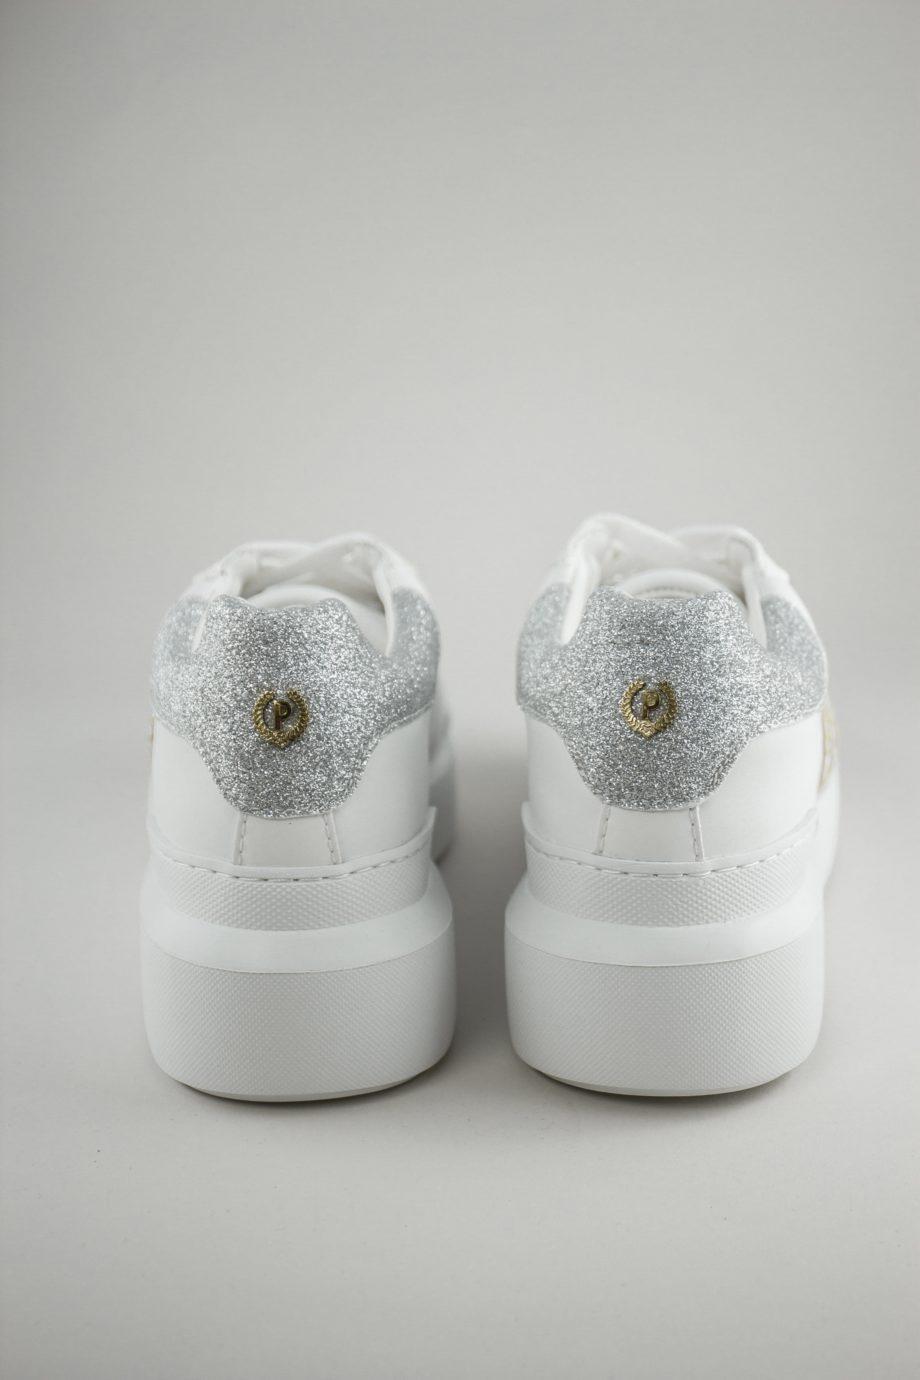 4. POLLINI White sneakers